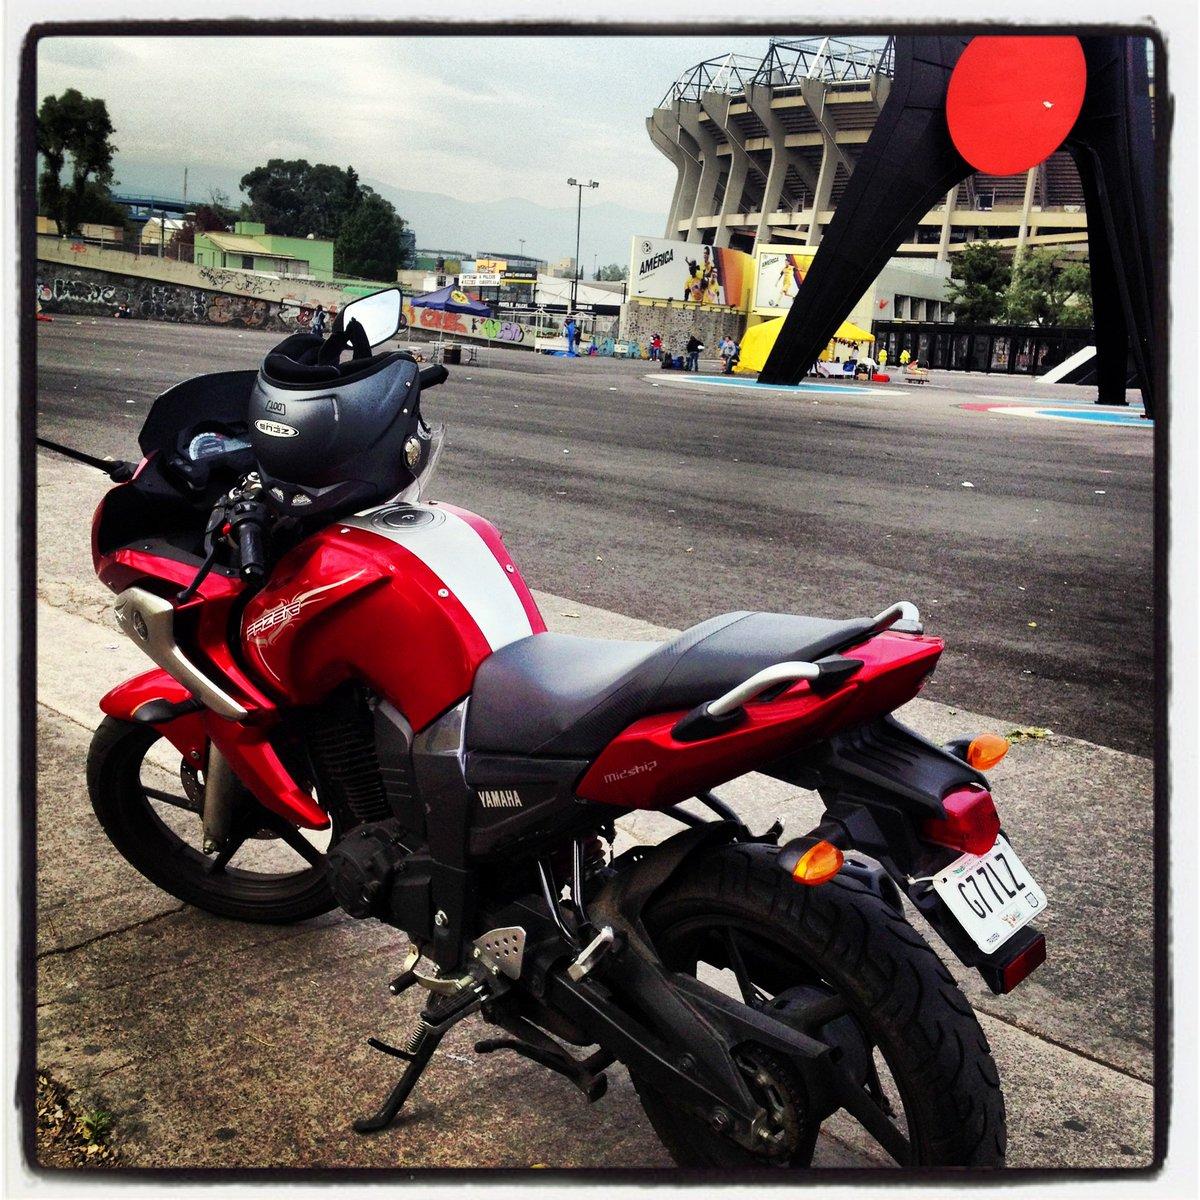 #MotoRobada Yamaha Fazer 16 Placas G77LZ. Robada en el DF Villa Coapa. No compren piezas usadas. RT. https://t.co/bQ4MOd4Woh